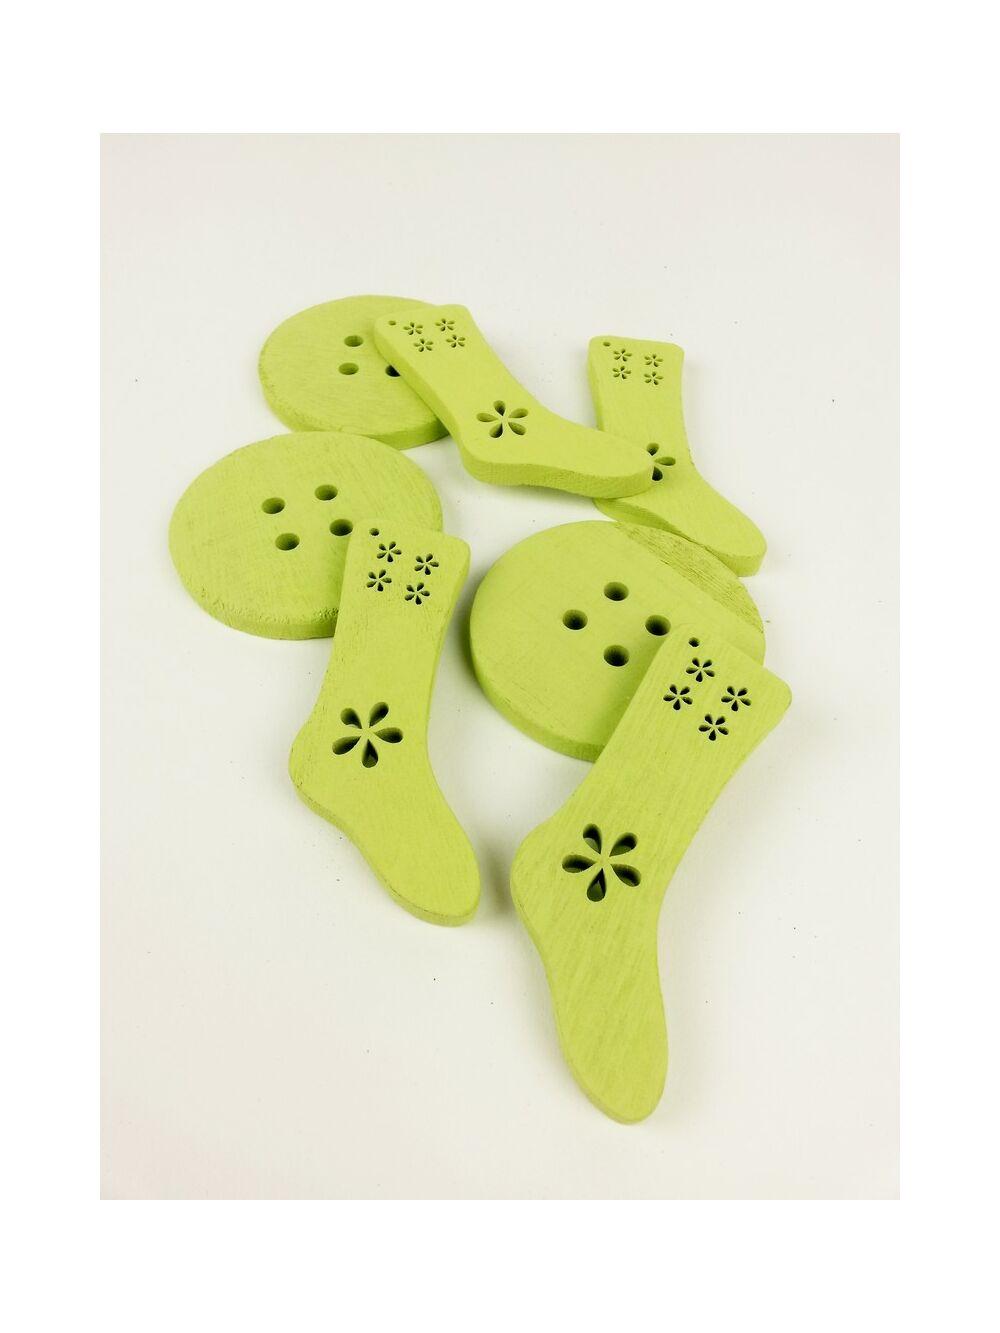 Fa dekor zokni gomb - Zöld